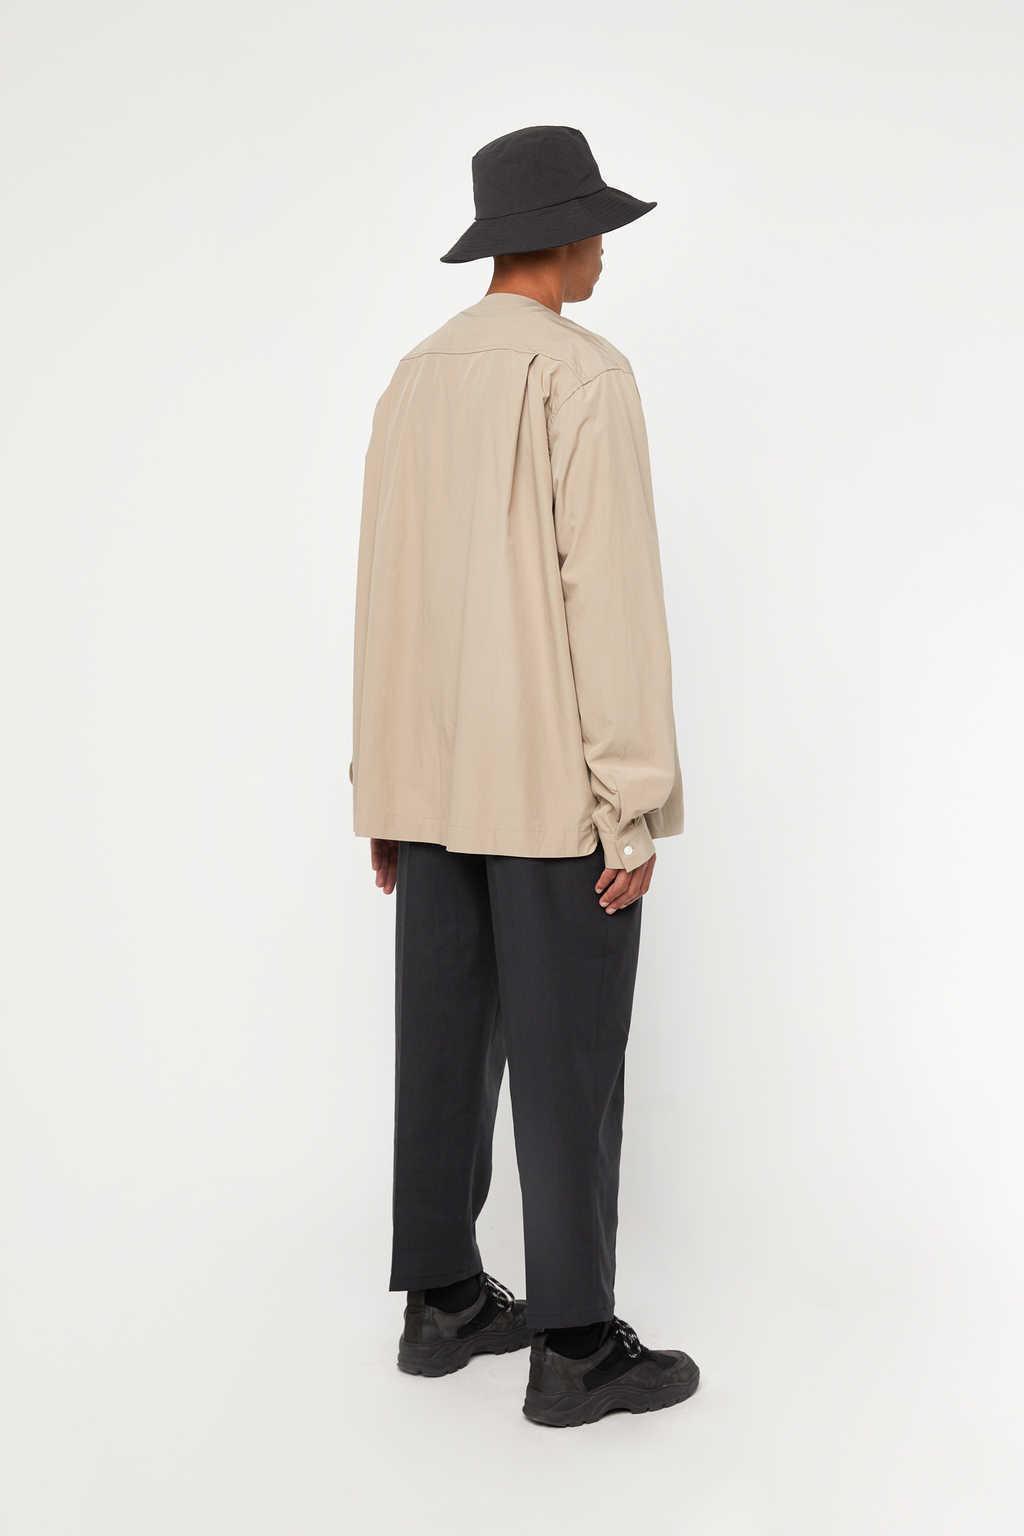 Shirt K008 Beige 5